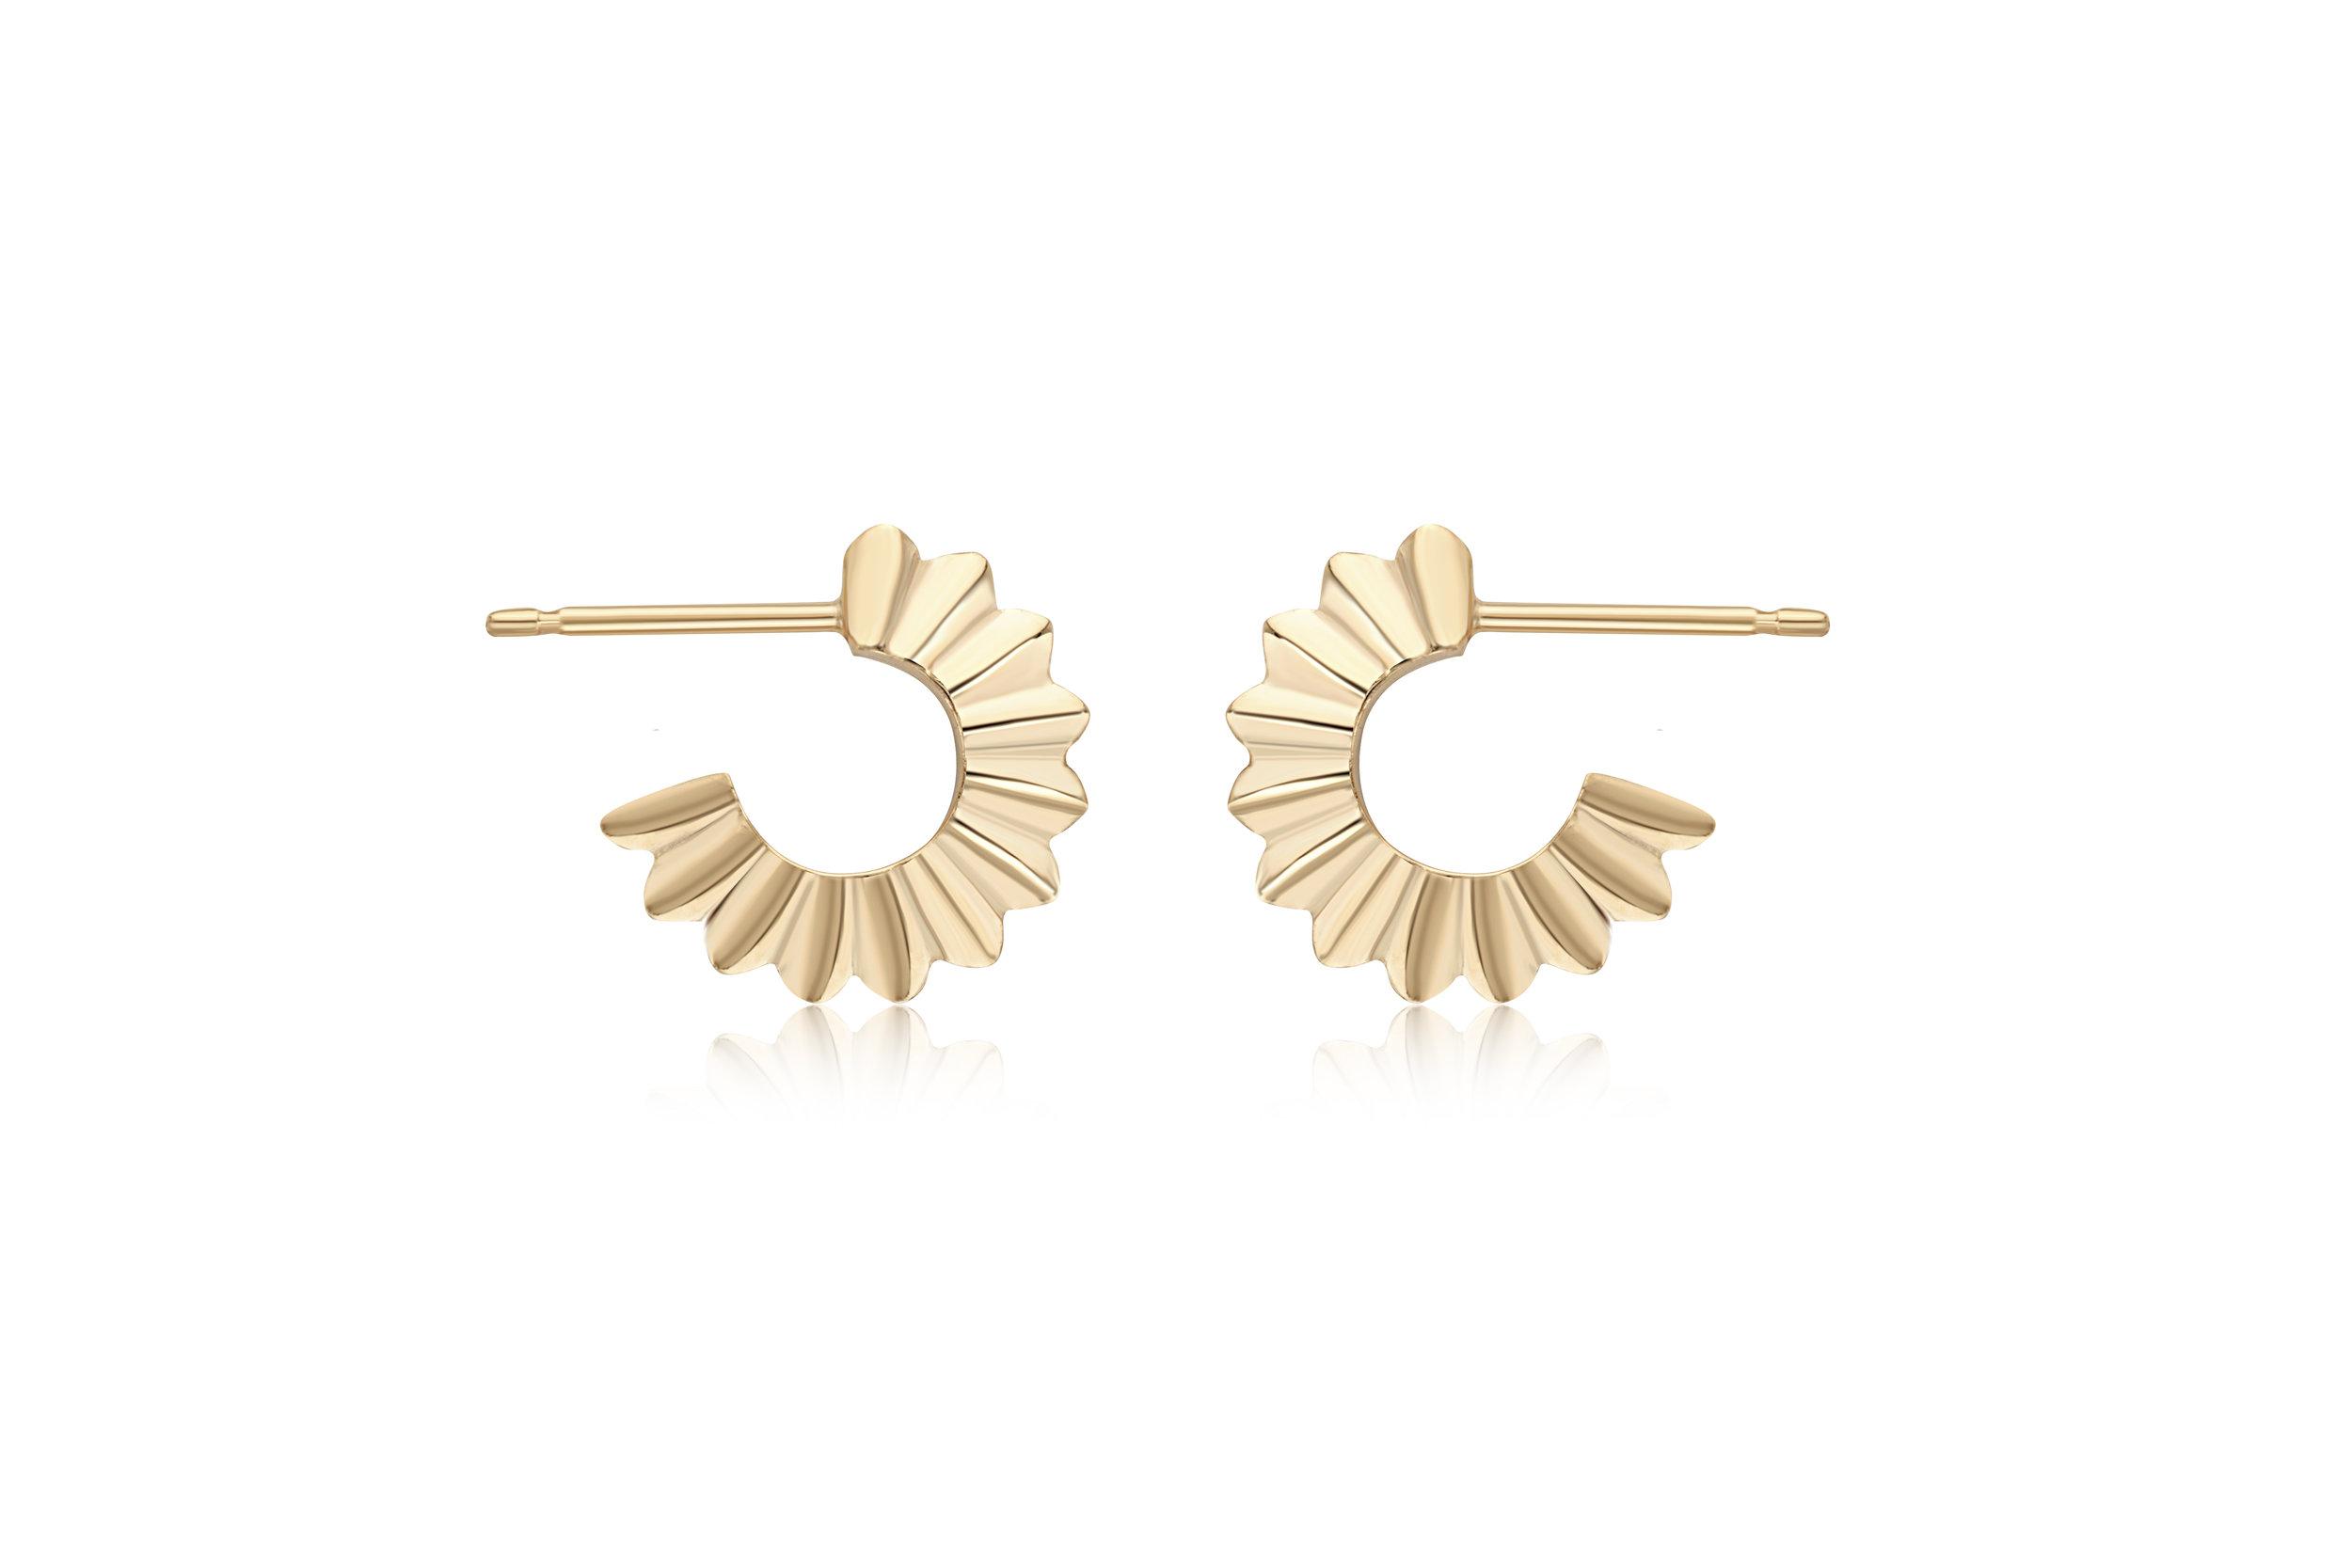 Flora Bhattachary Aditi Pankhuri Hoop Earrings 9 carat yellow.jpg